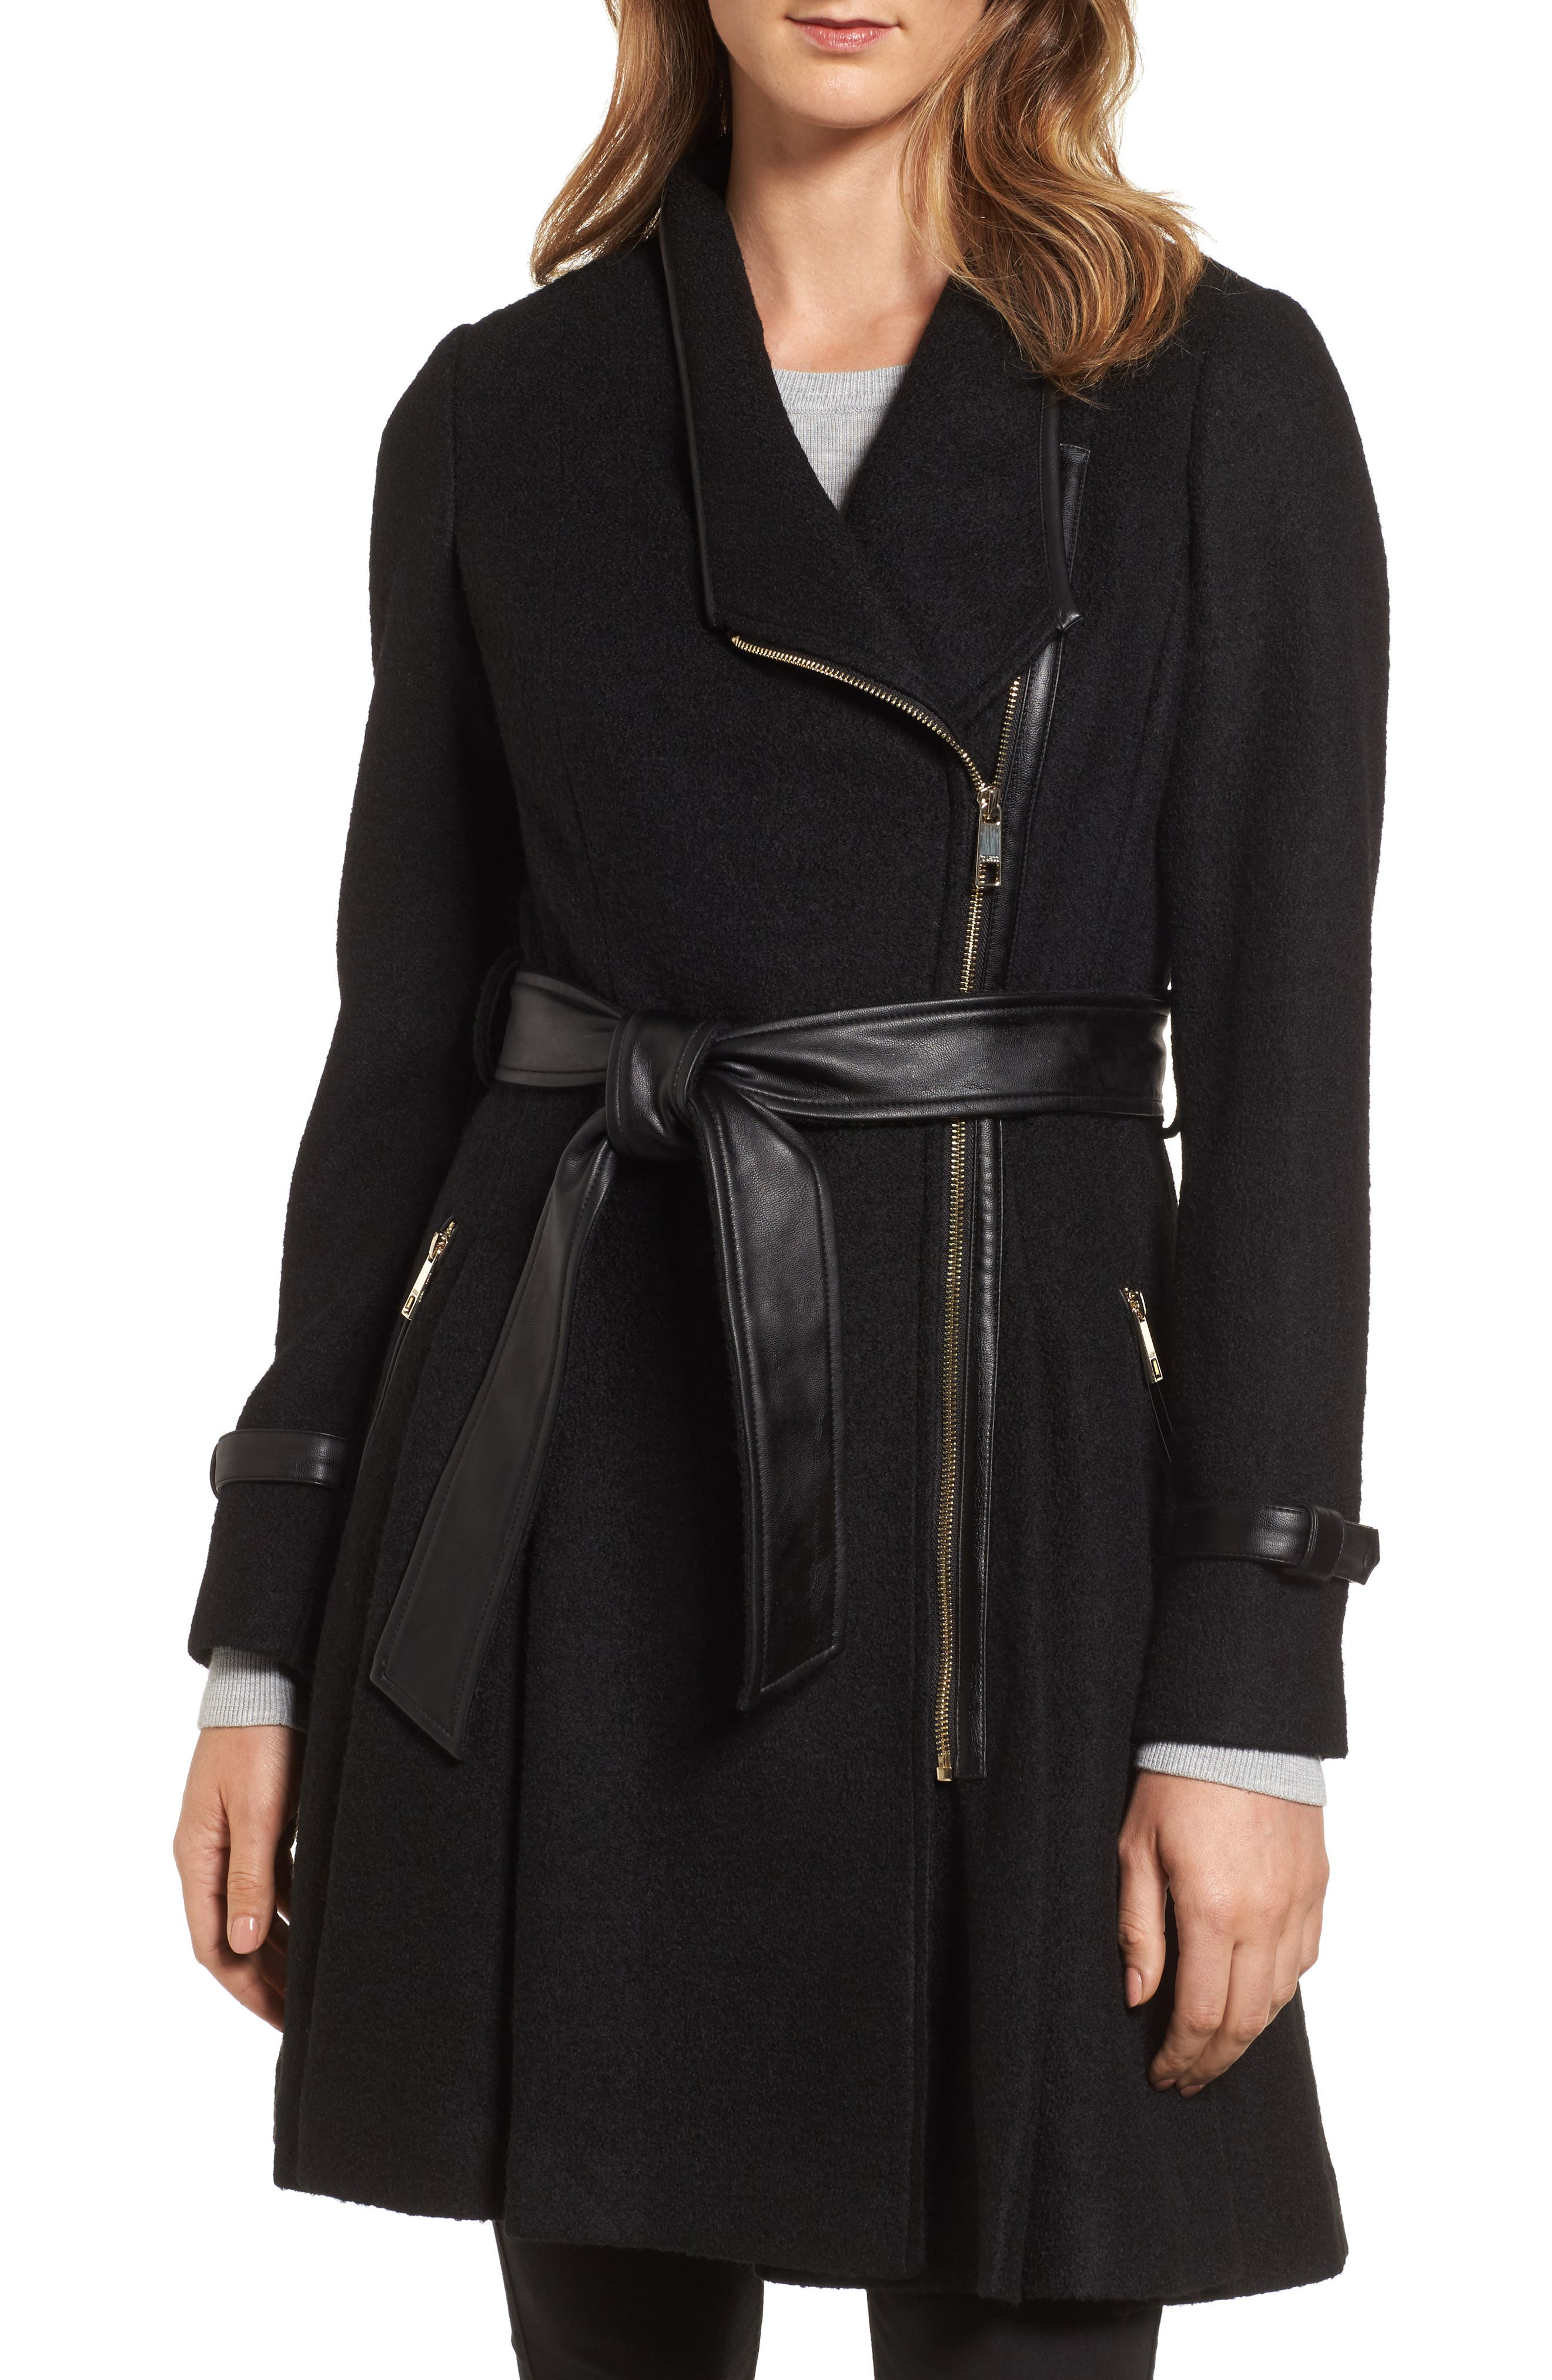 Belted Boiled Wool Blend Coat,                             Main thumbnail 1, color,                             Black